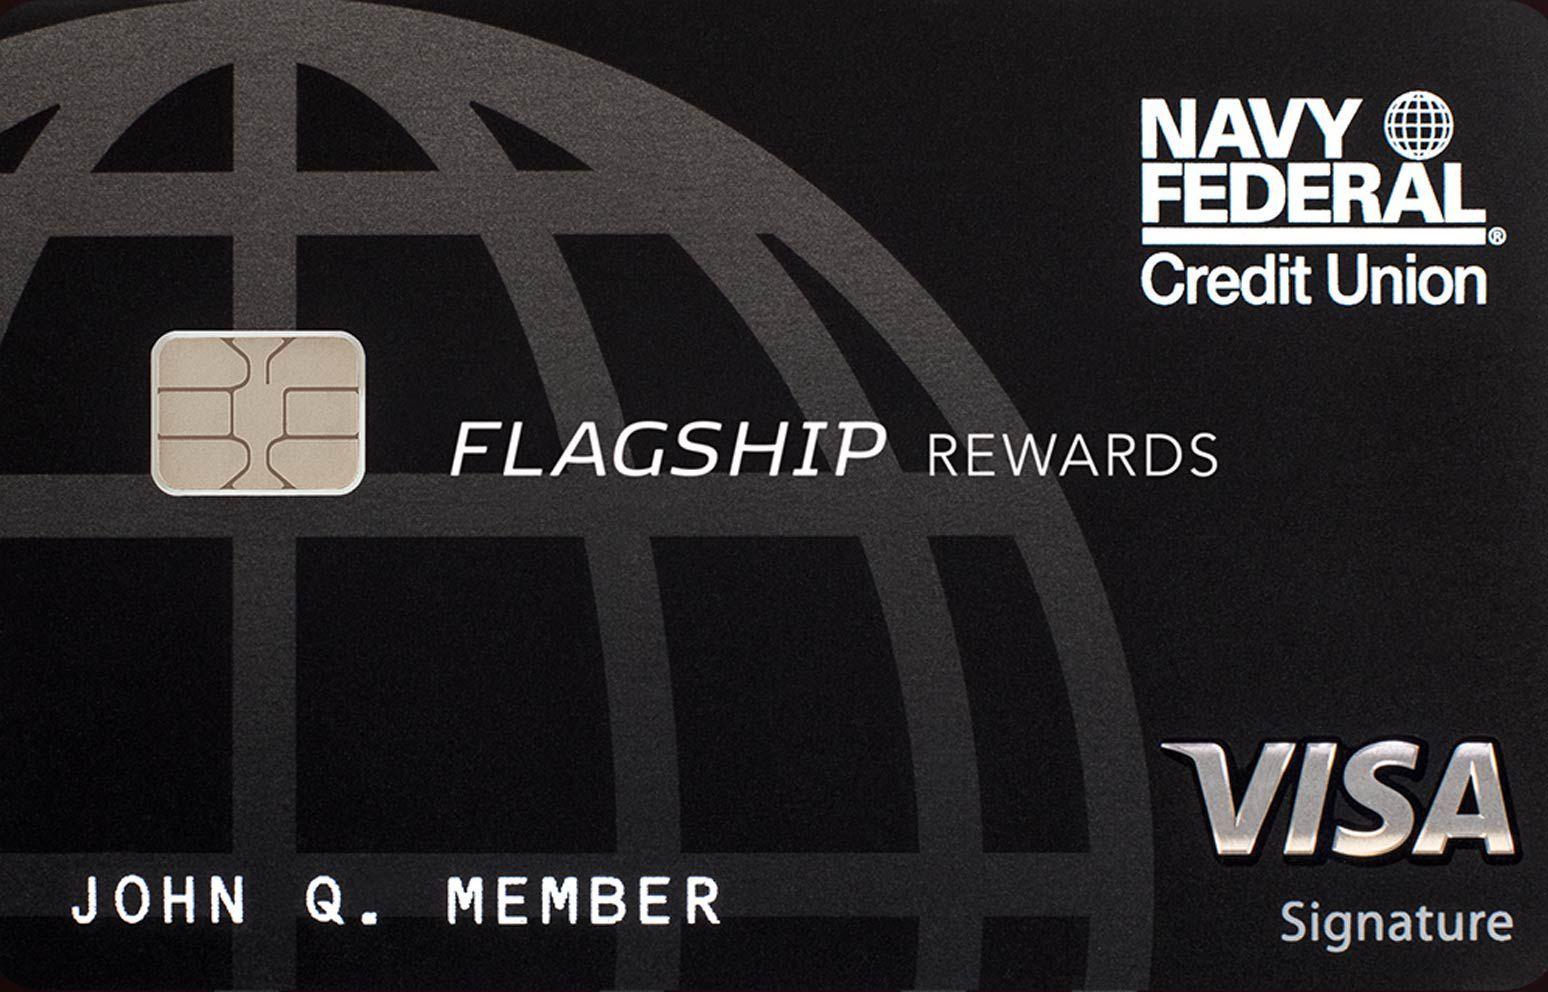 Navy federal credit card rewards credit cards credit